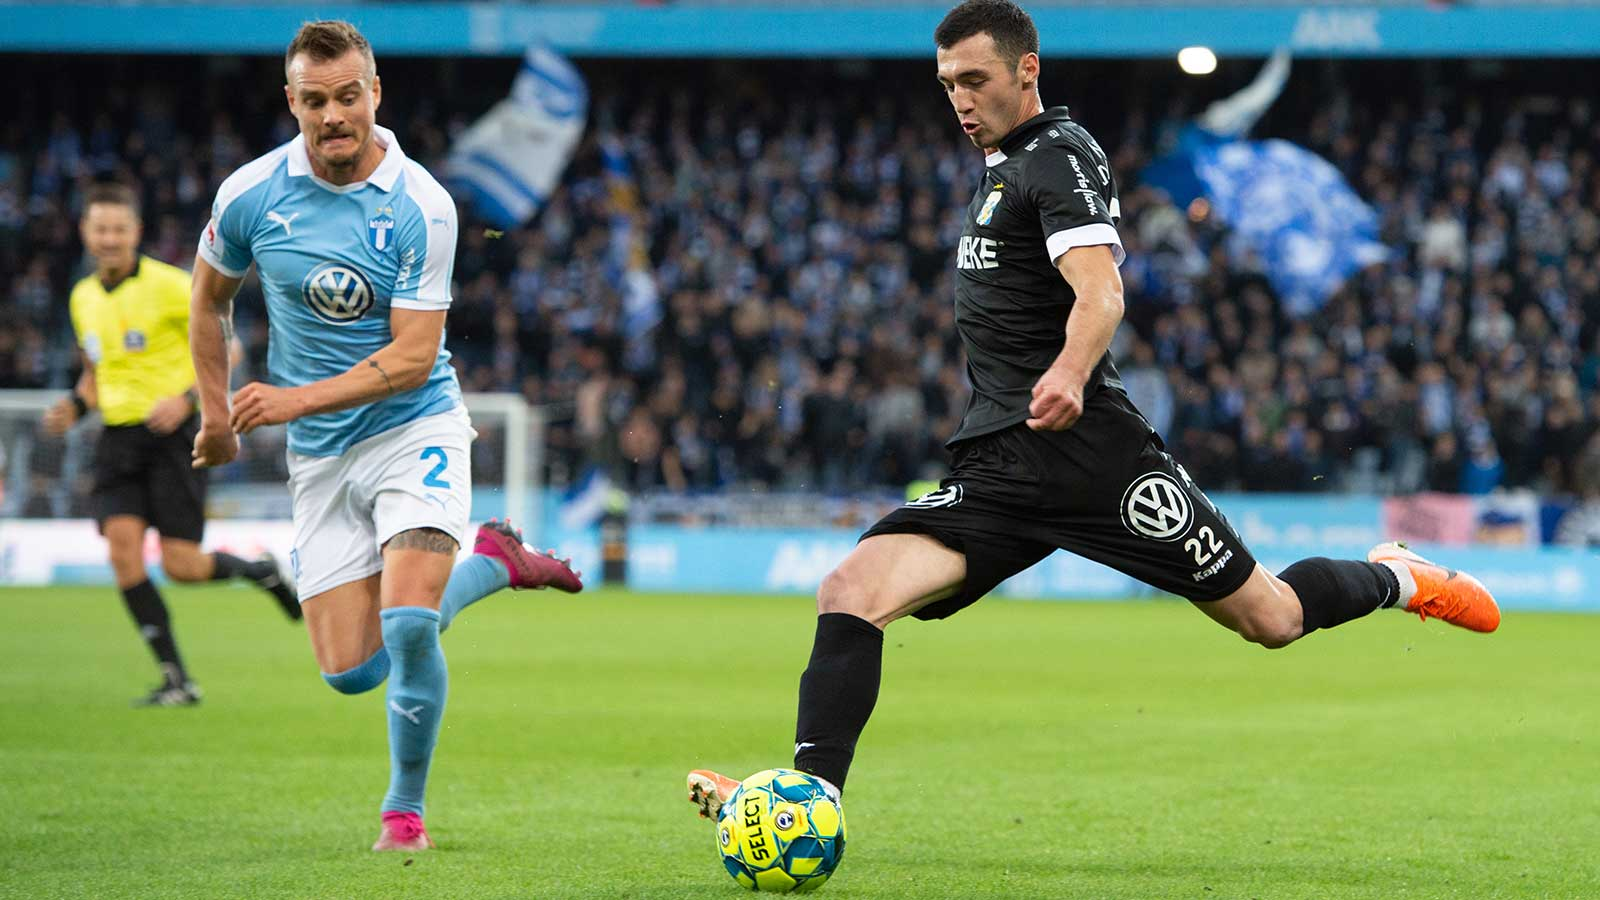 IFK Göteborg: Förlust mot Malmö